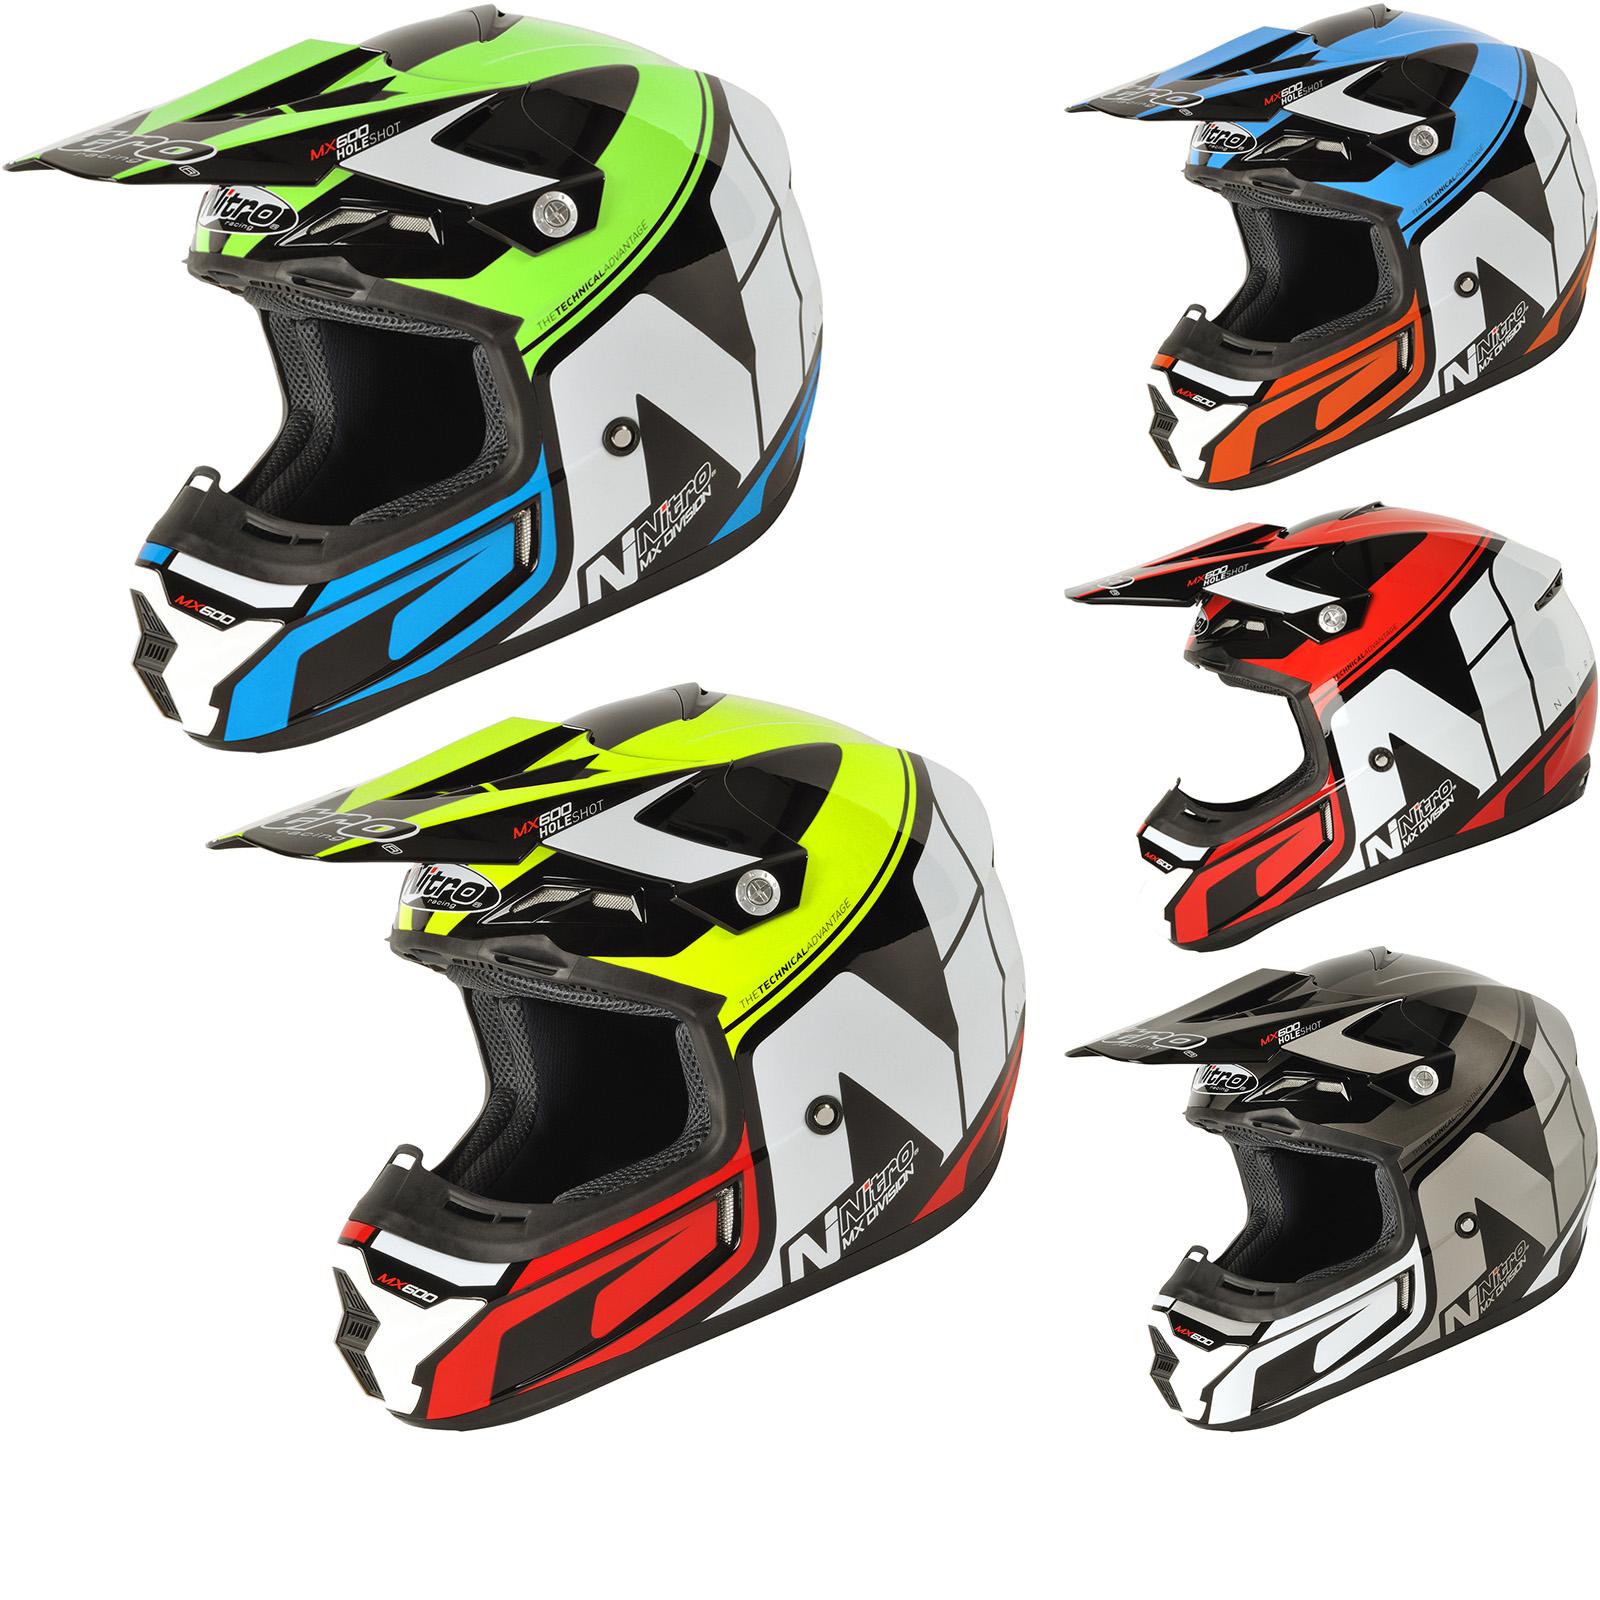 Nitro mx600 holeshot motocross helmet new arrivals ghostbikes com